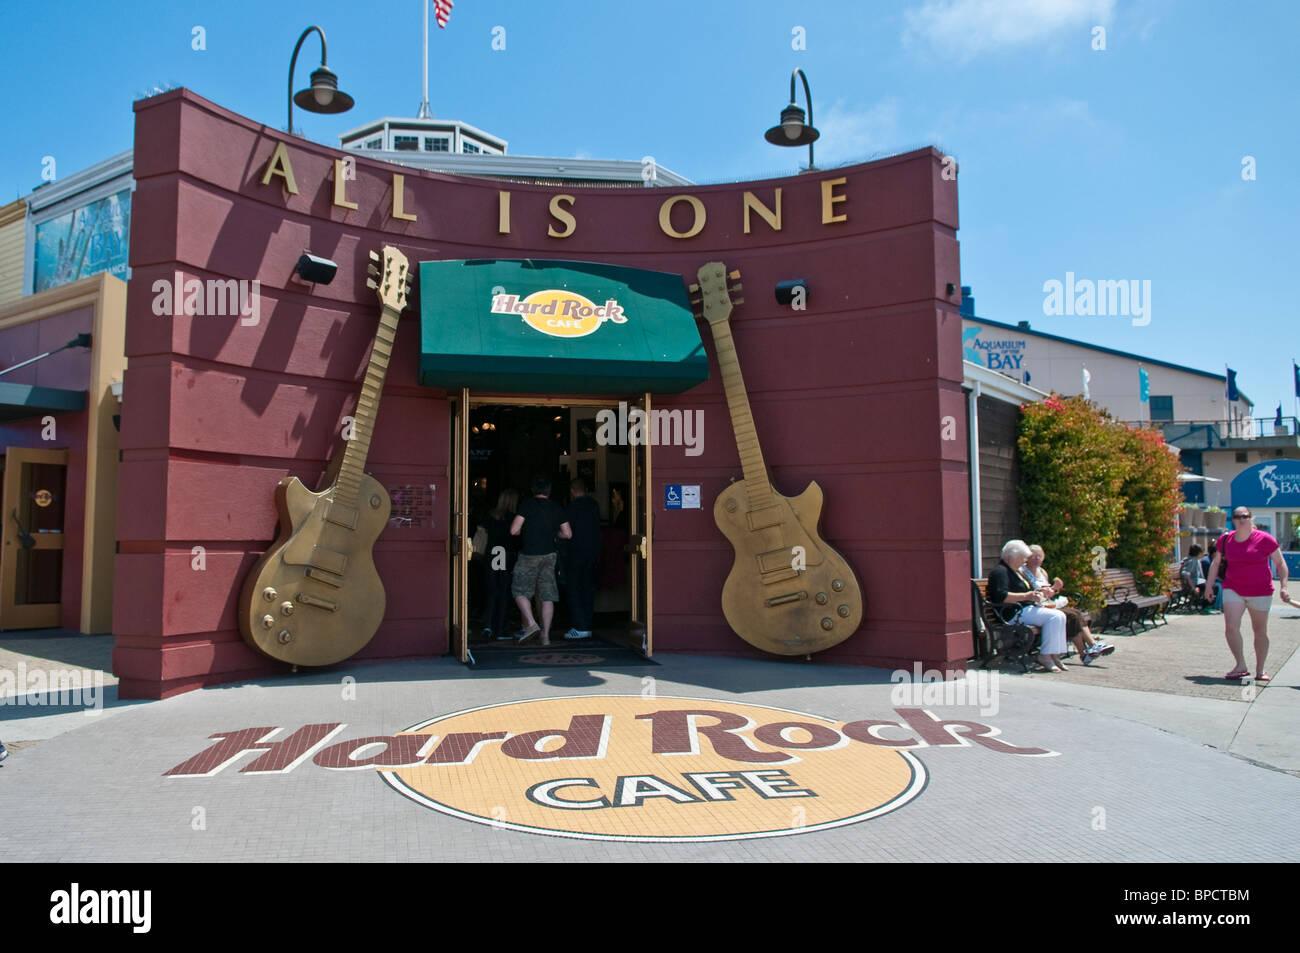 Hard Rock Cafe, Pier 39, Fishermans Wharf, San Francisco, Californien, USA - Stock Image